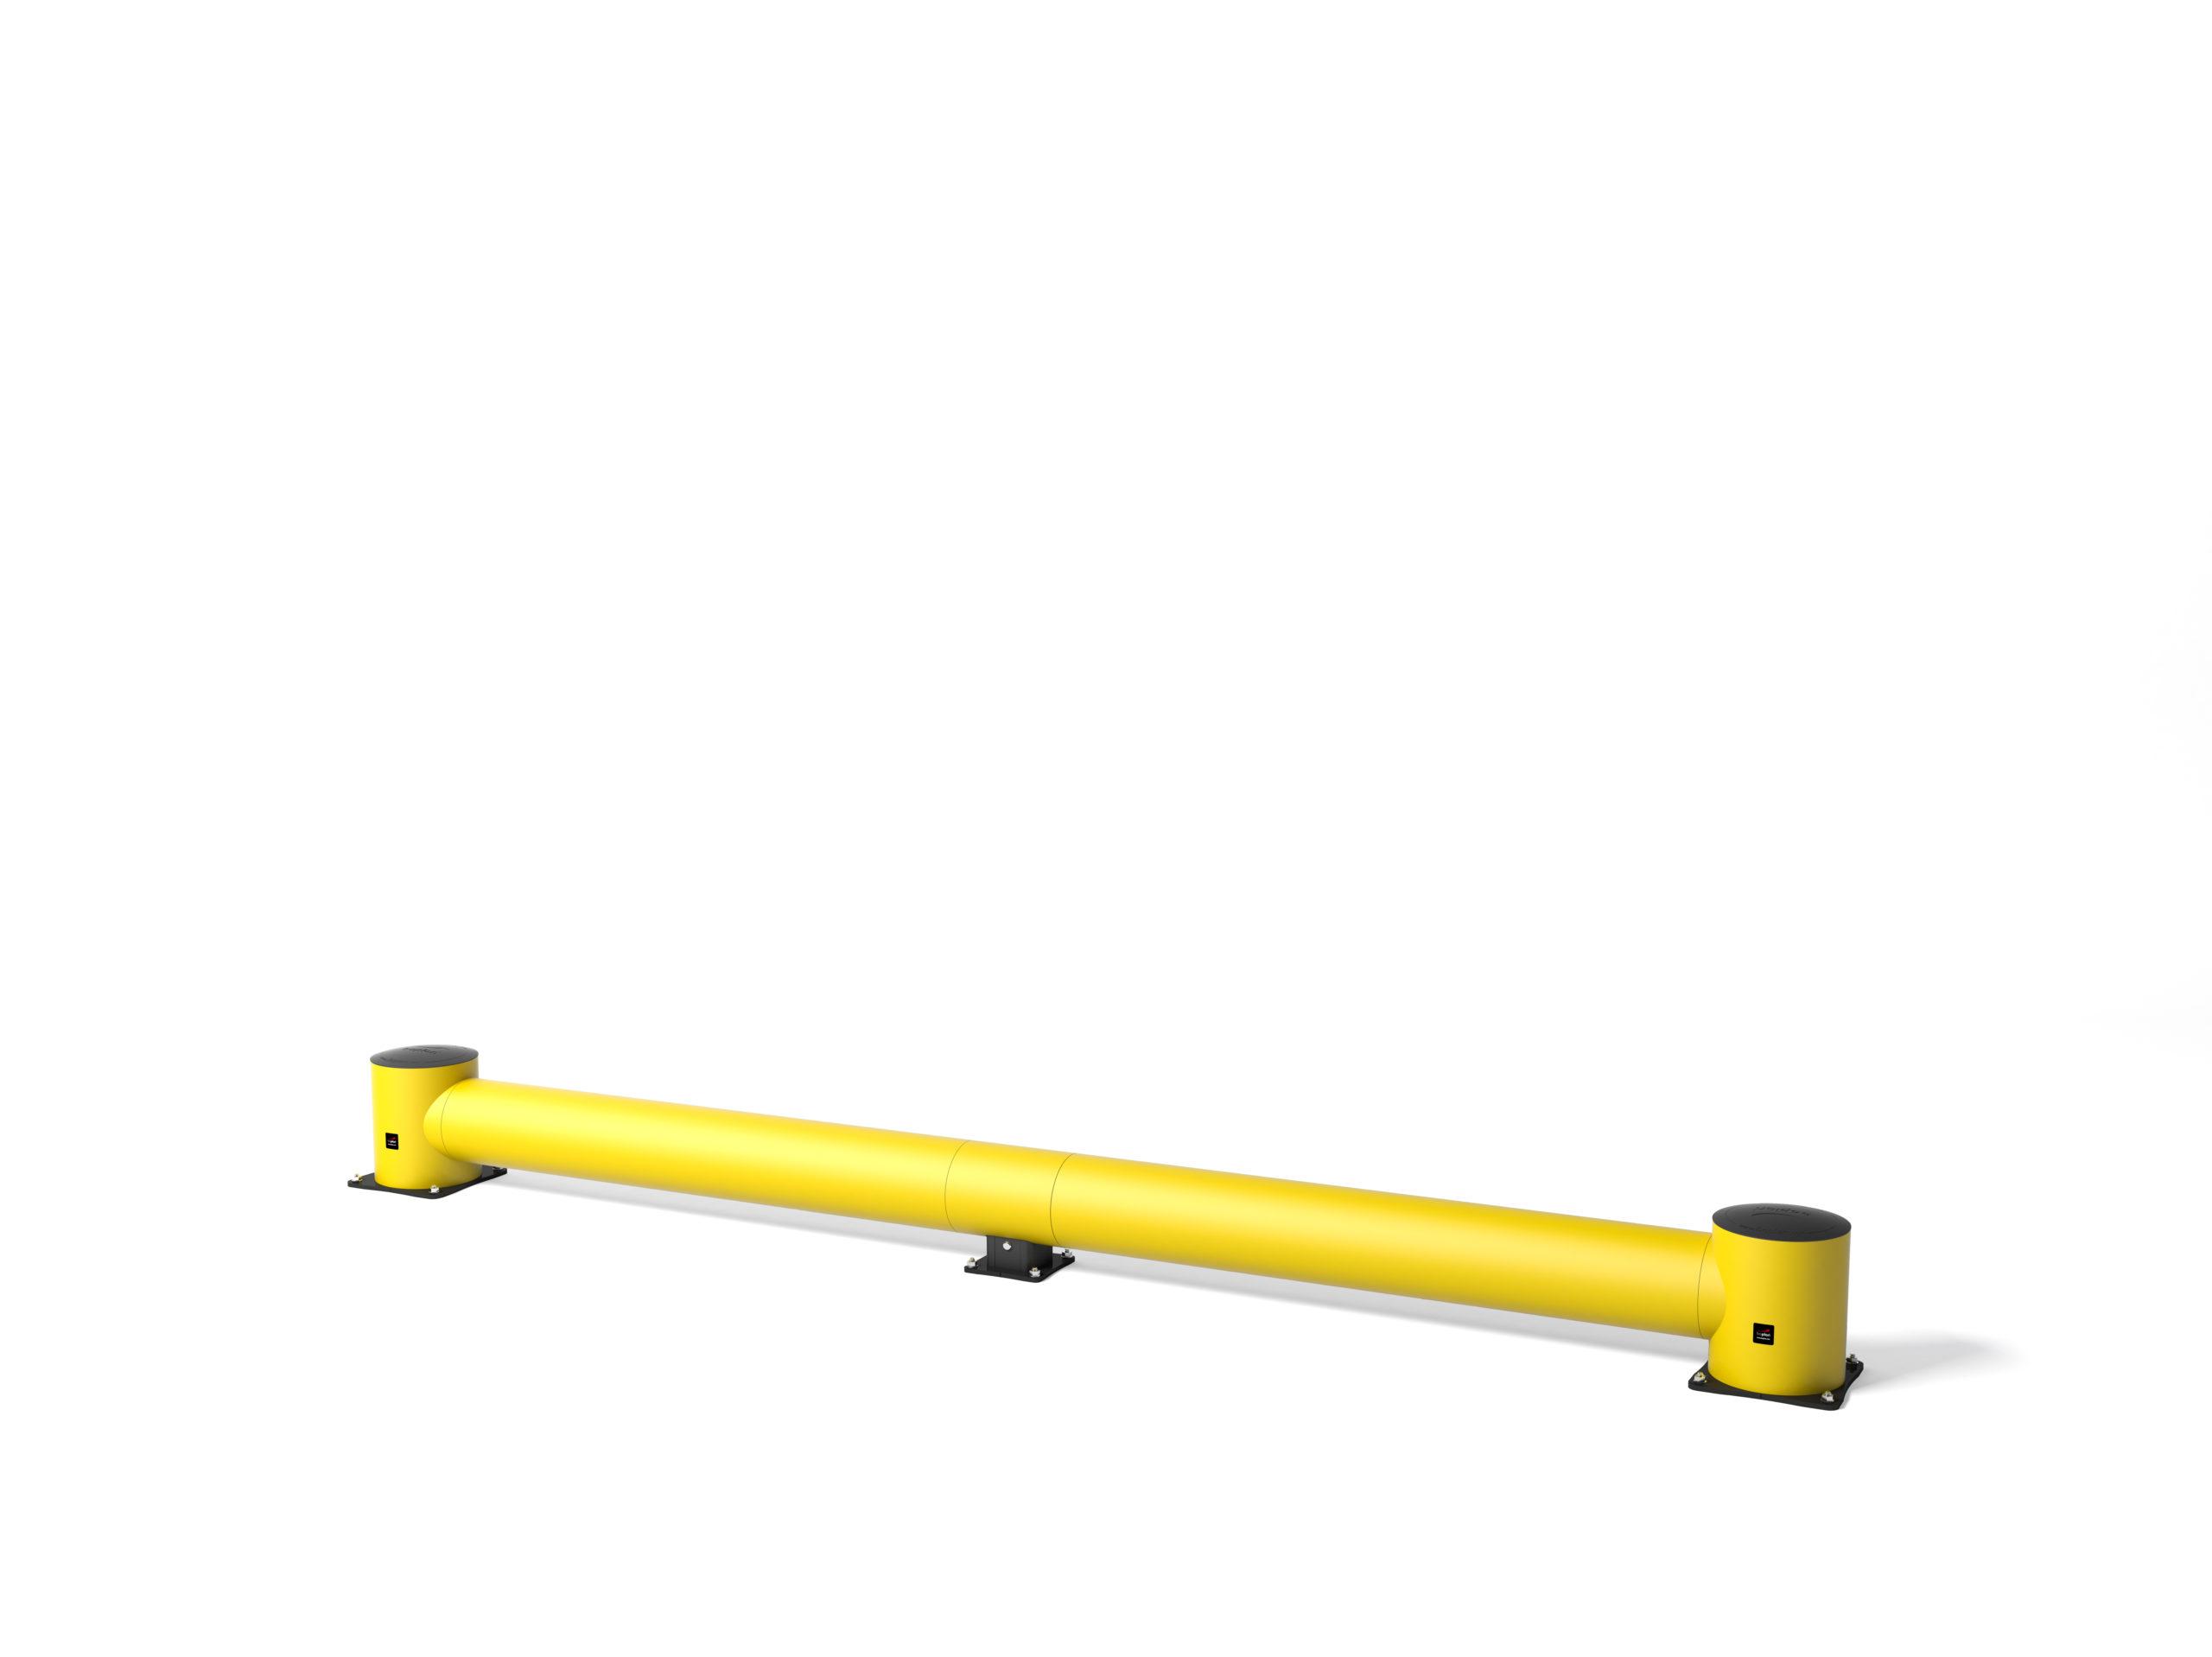 TB 260: barriera di protezione per carrelli bassa